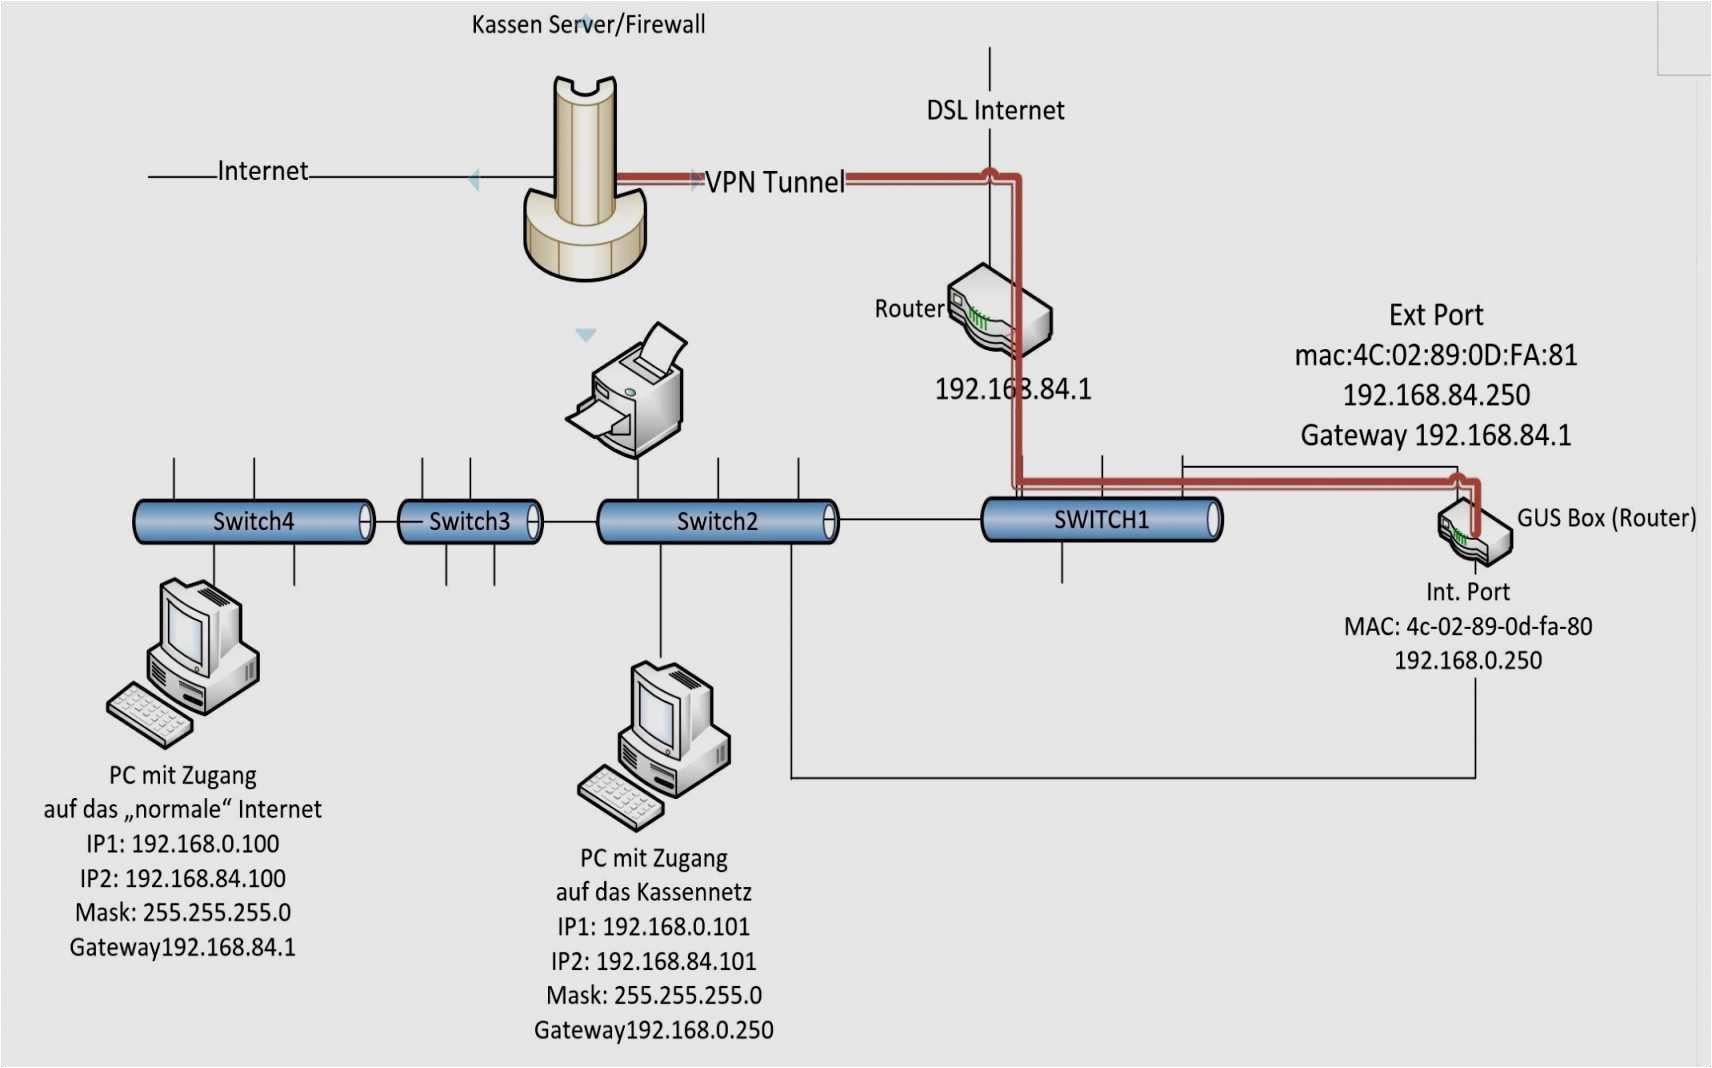 12v generator wiring diagram ridgid 300 switch wiring diagram detailed schematics diagram of 12v generator wiring diagram jpg